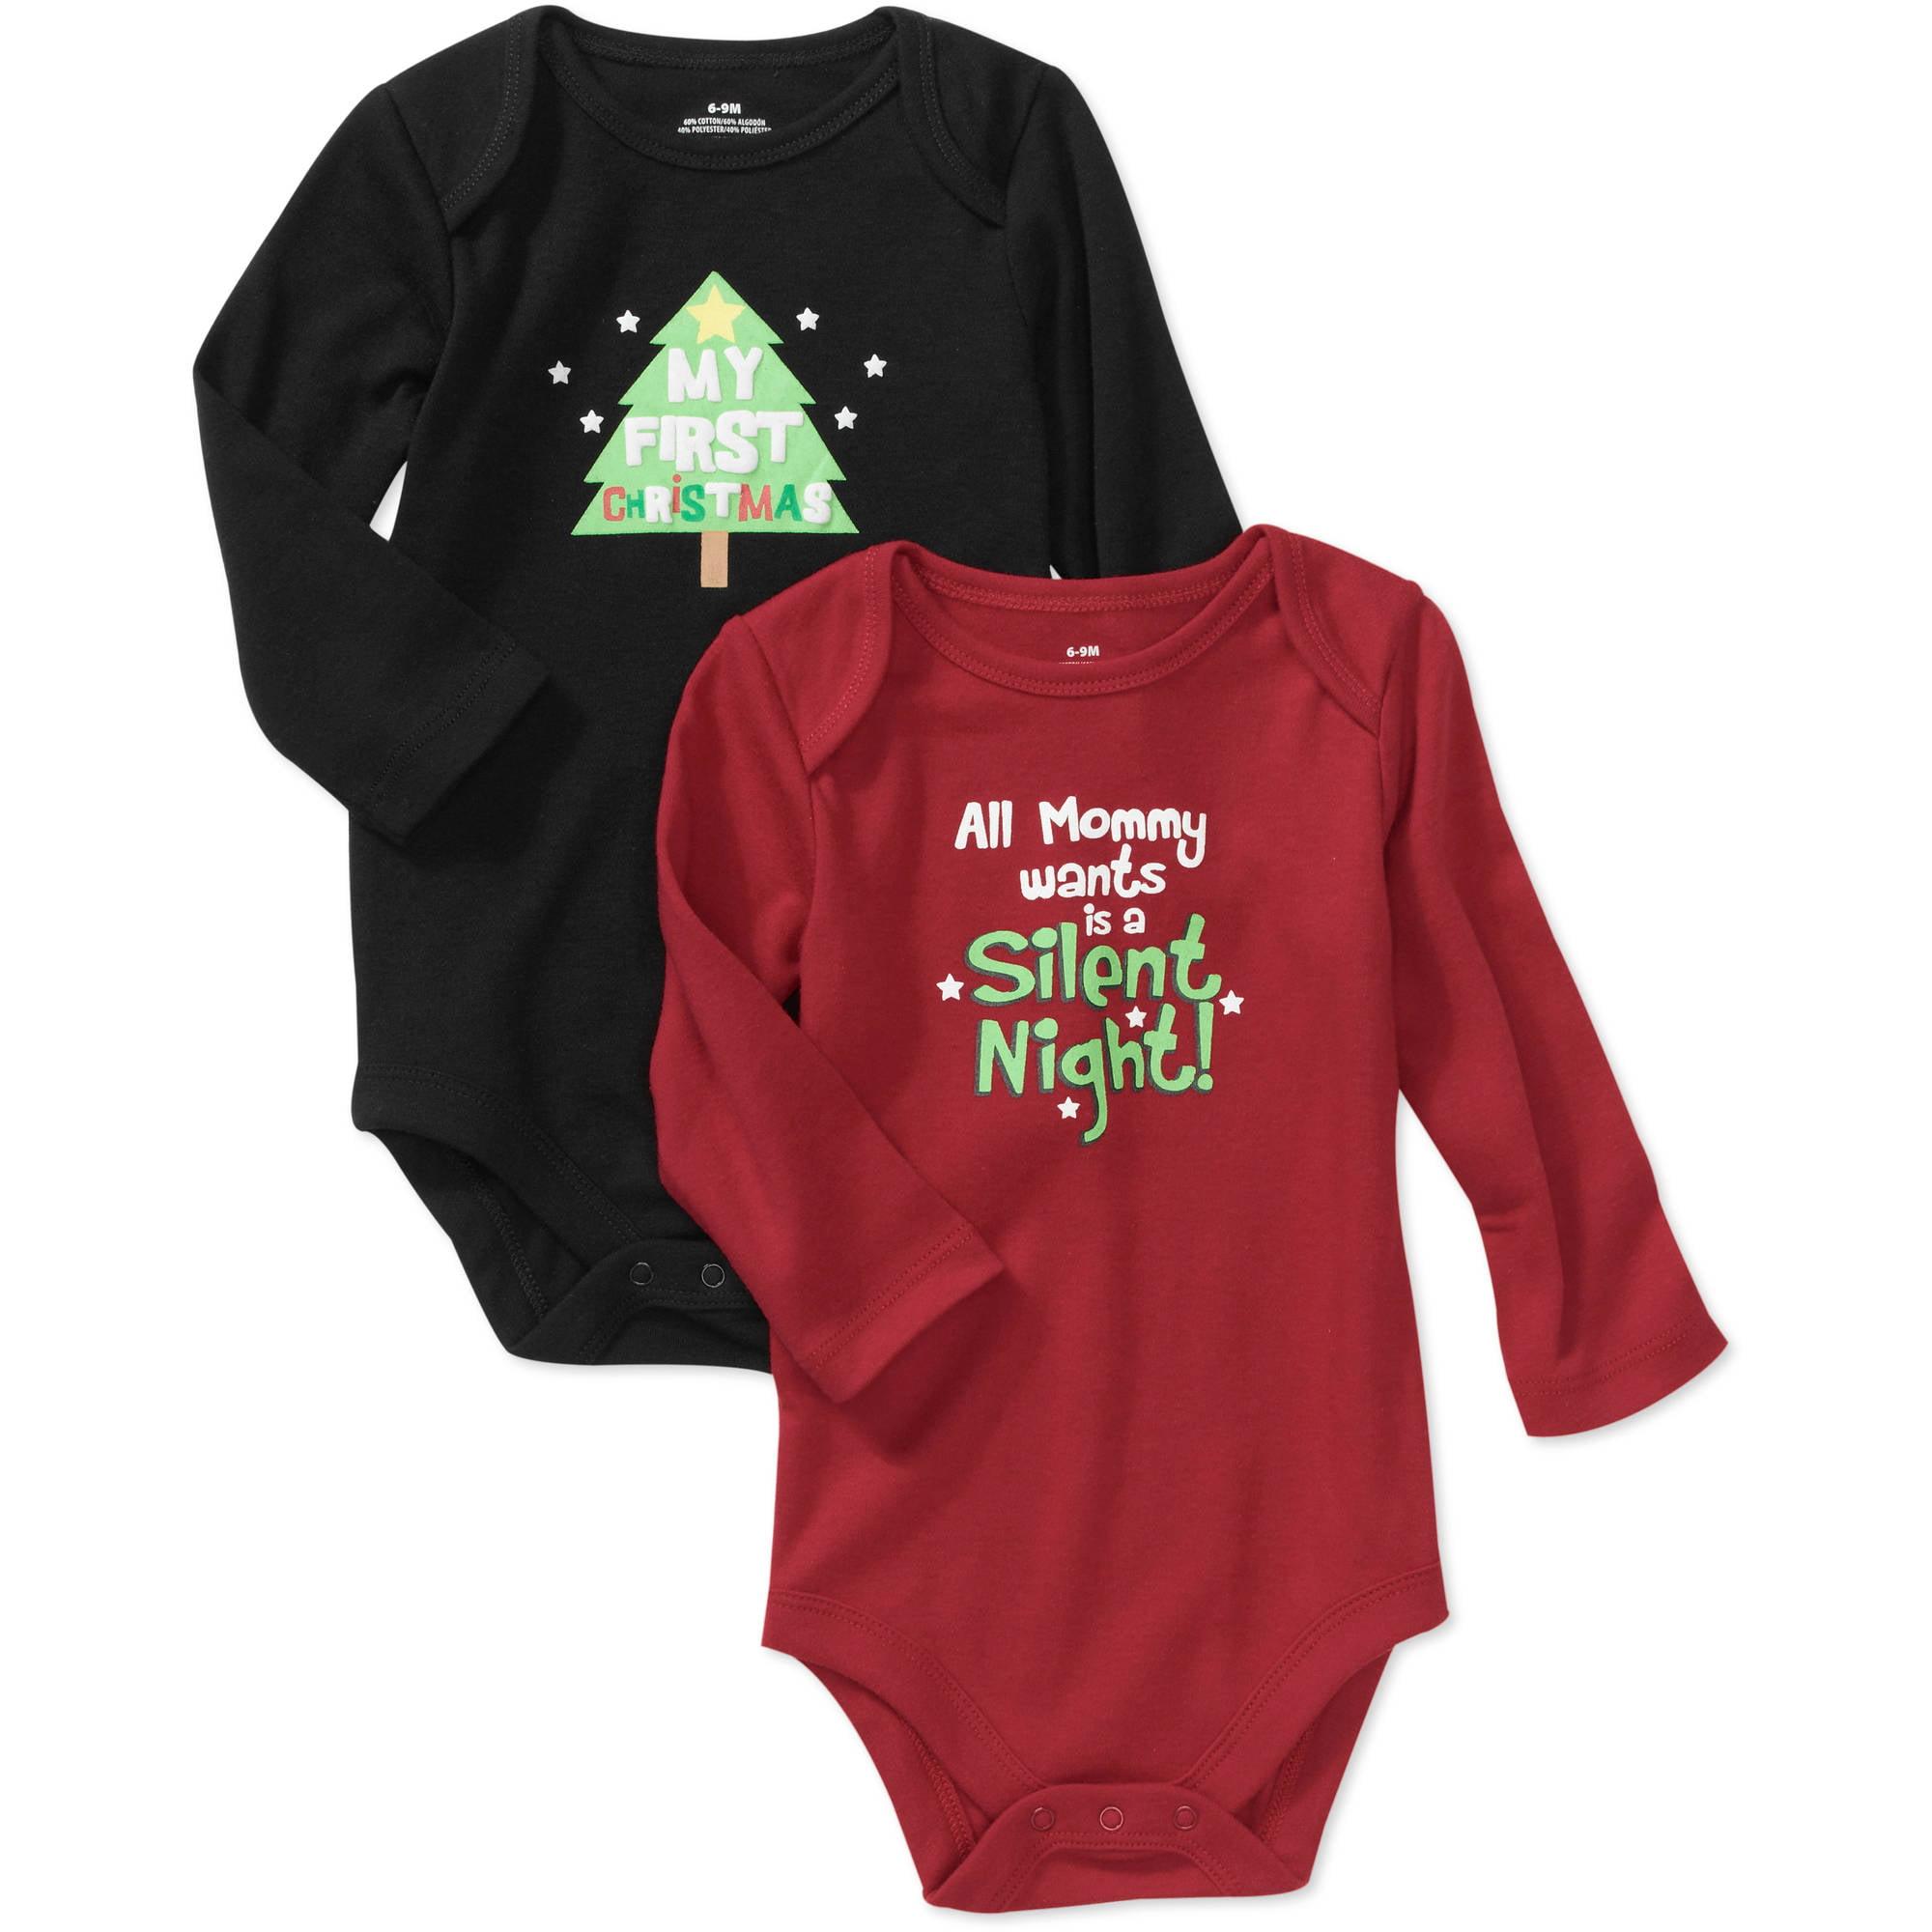 Newborn Boys' Holiday Creeper Set, 2-Pack